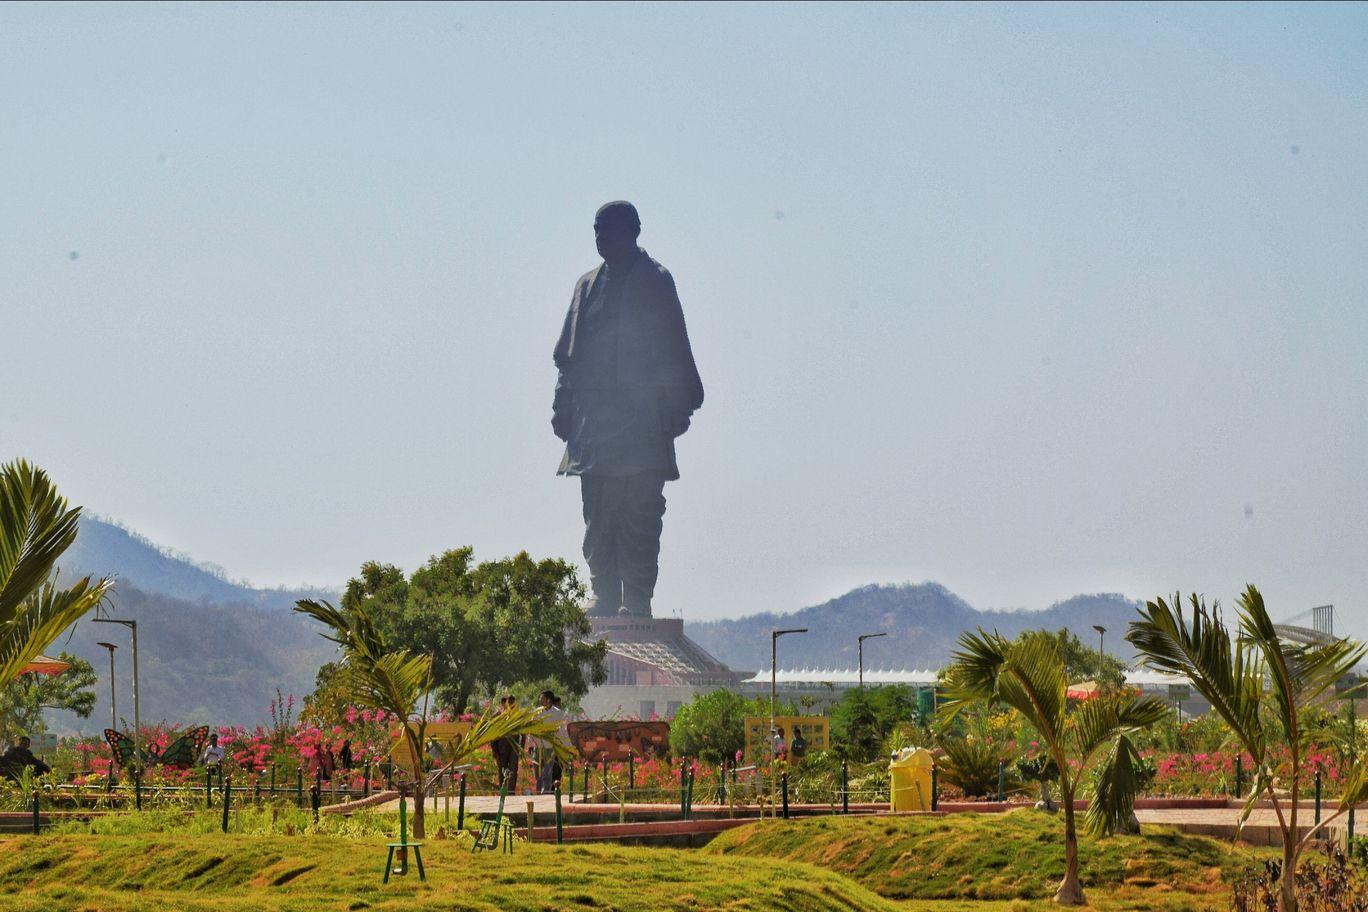 Photo of Statue of Unity By Karan Garg